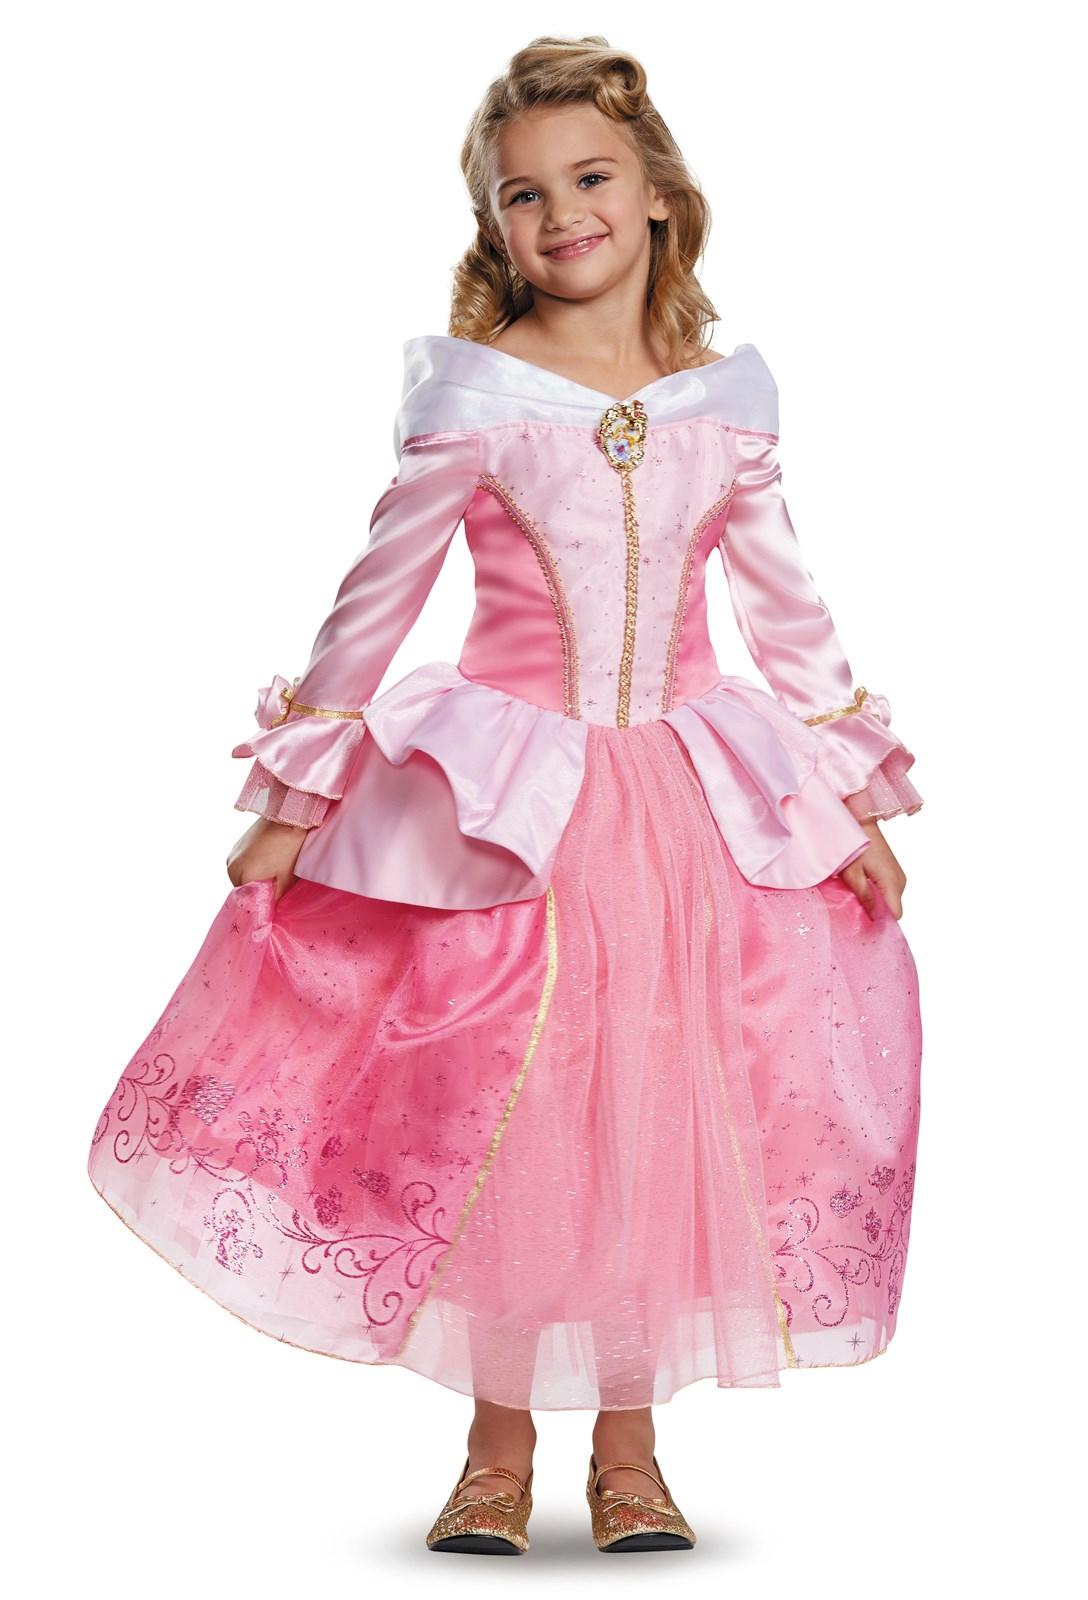 Disney Princess Aurora Costumes | BuyCostumes.com